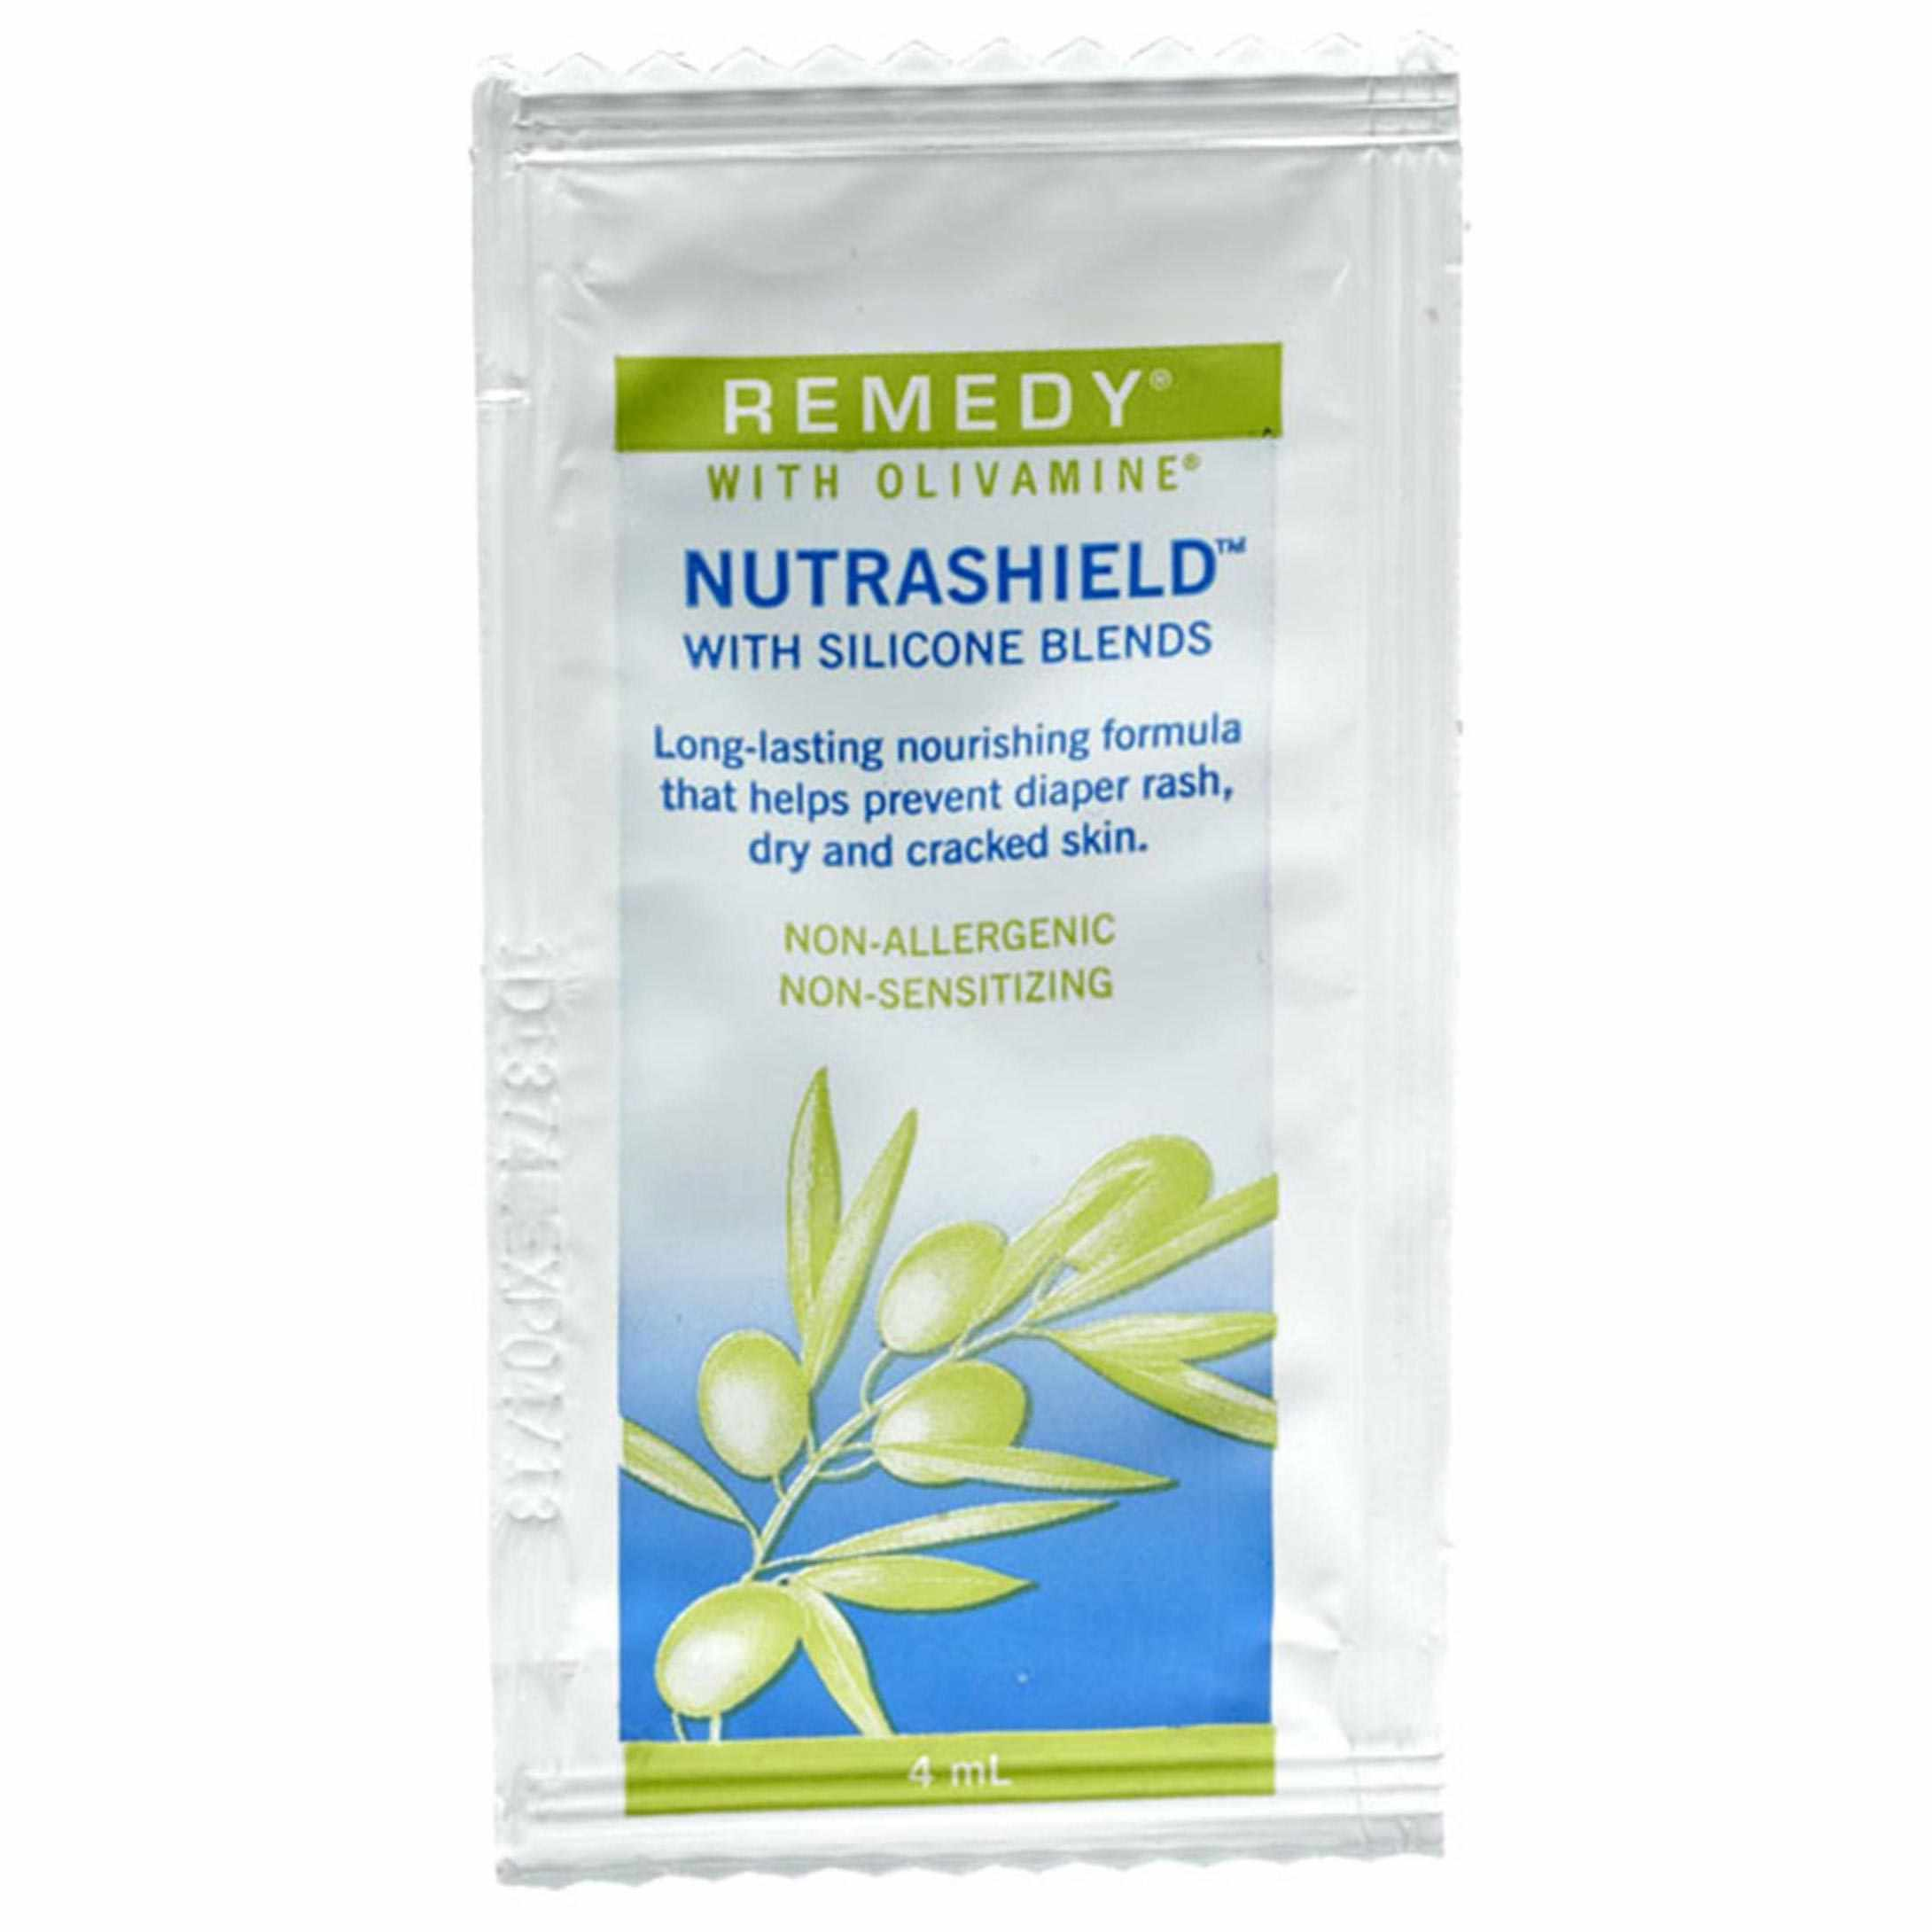 Remedy Nutrashield Skin Protectant Cream, Fruit Scent